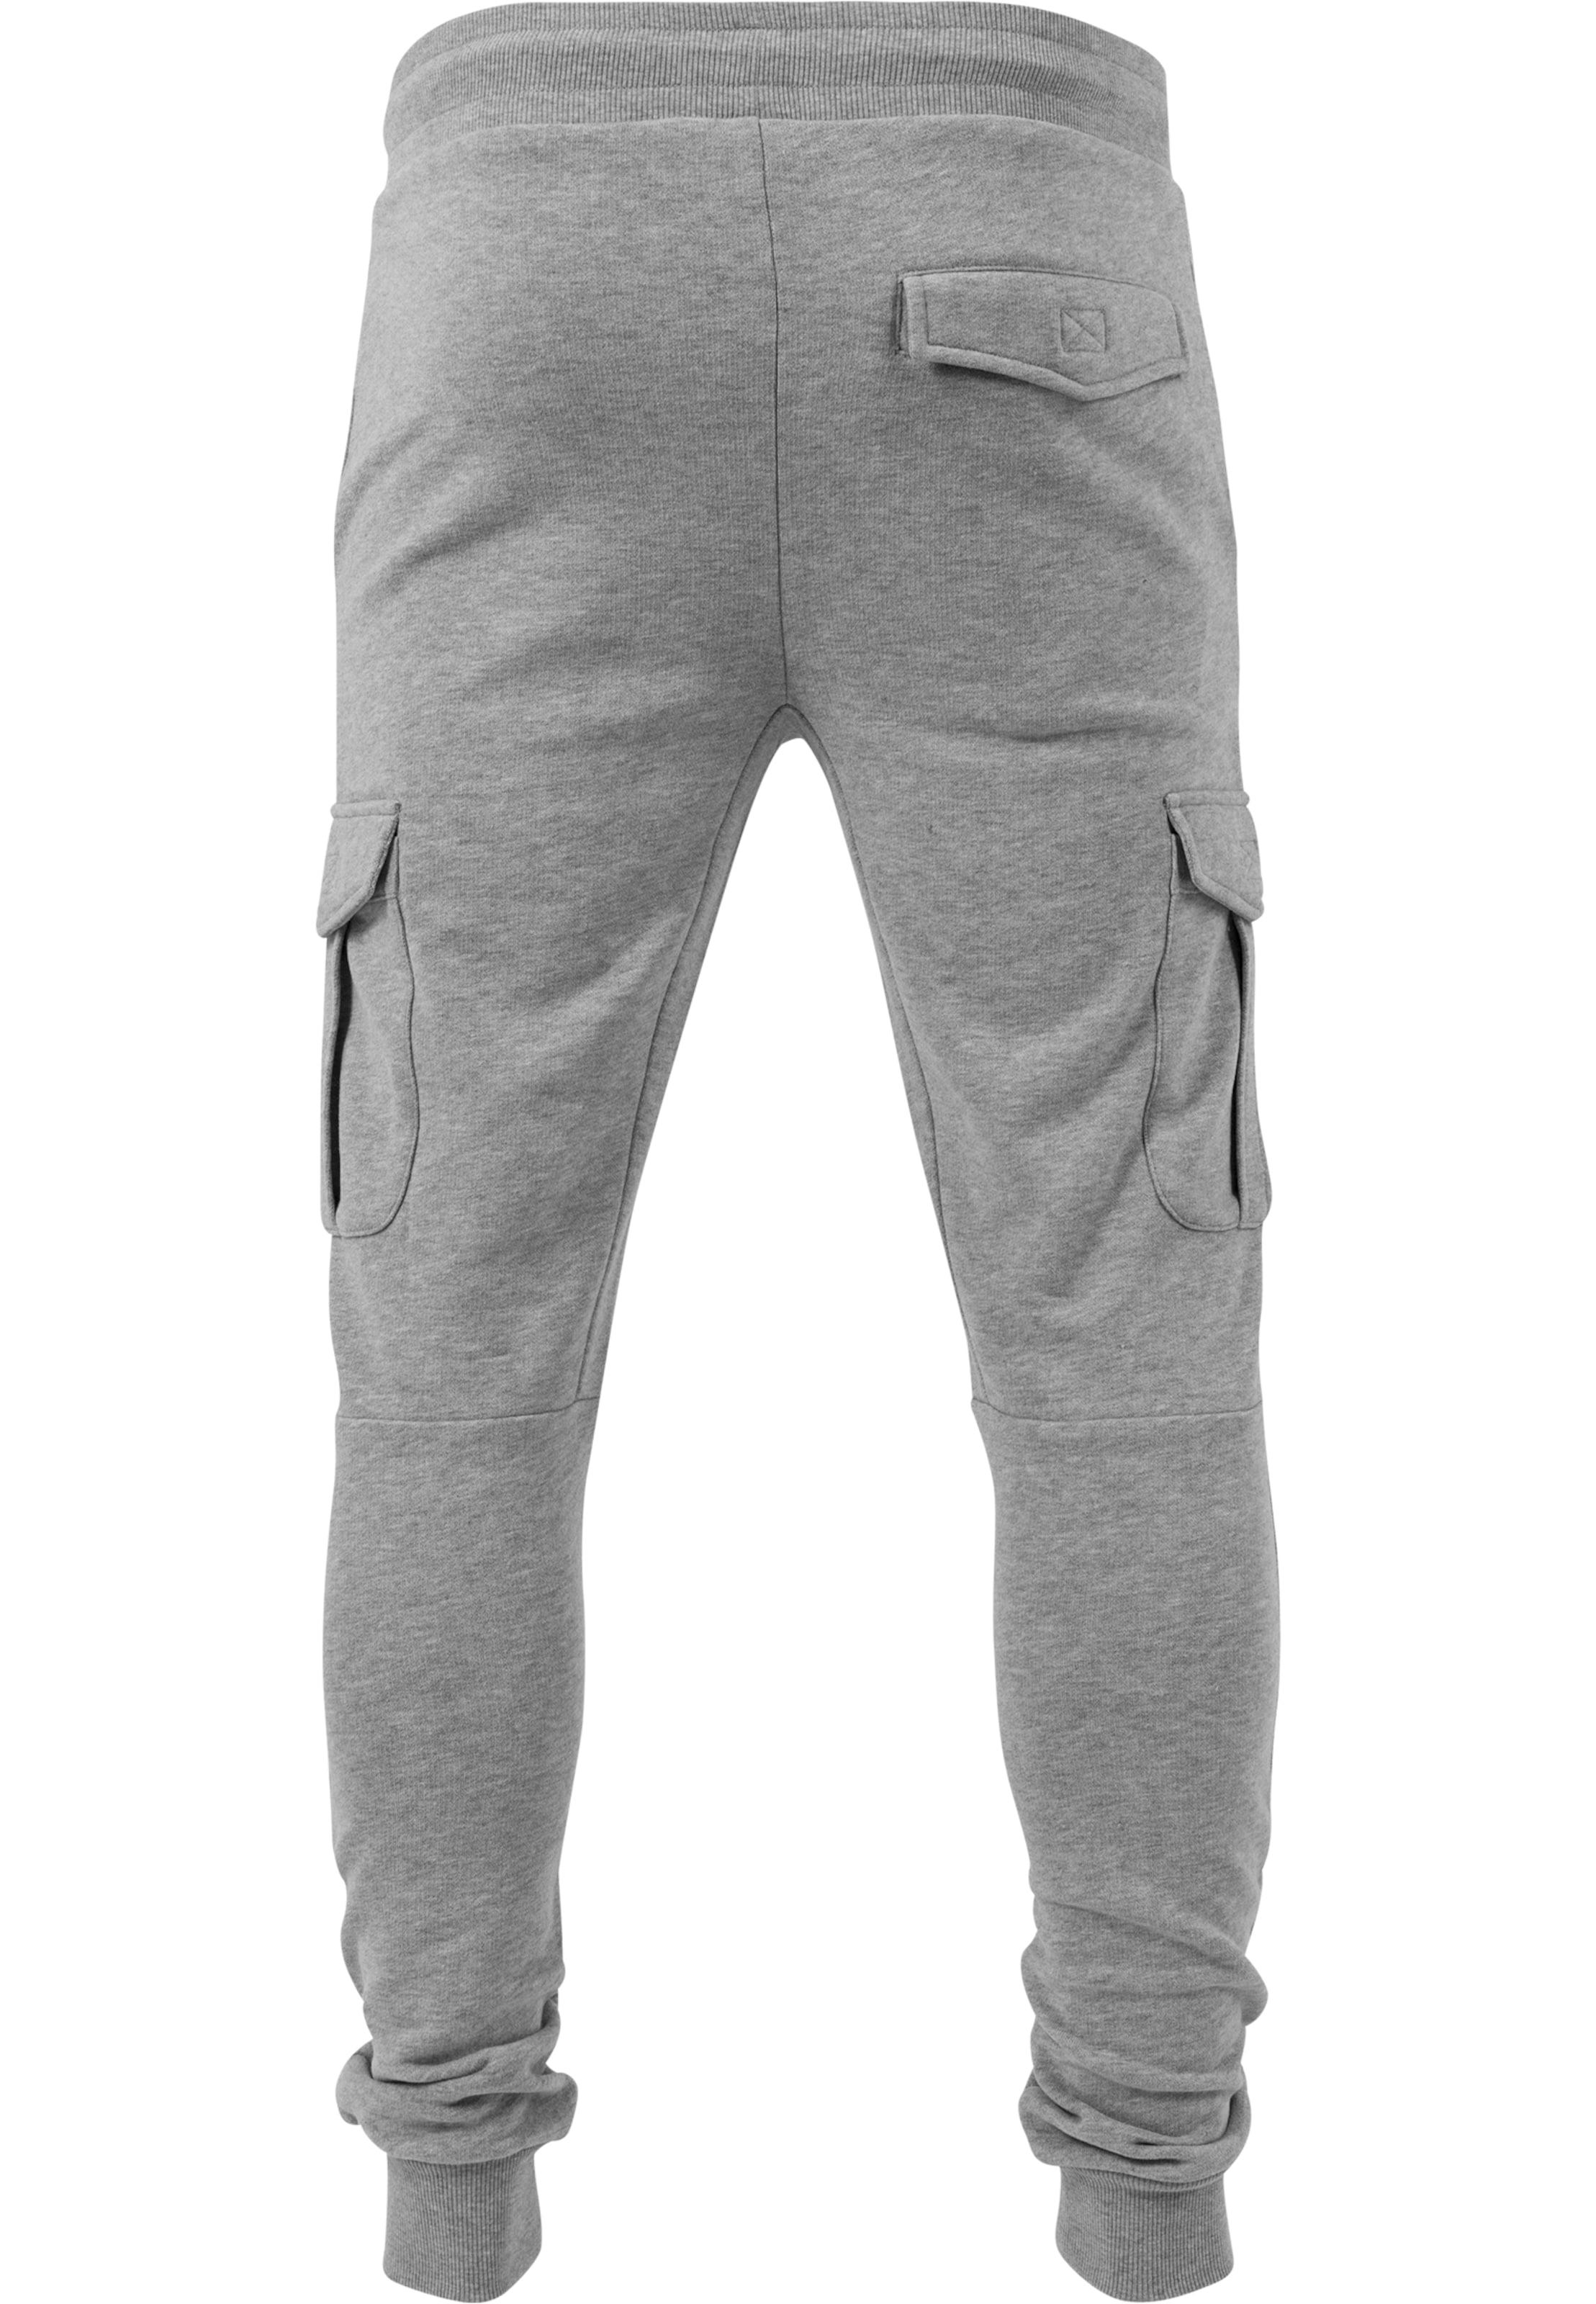 Cargo Grau Sweatpants Classics In Urban dxeQrECBoW